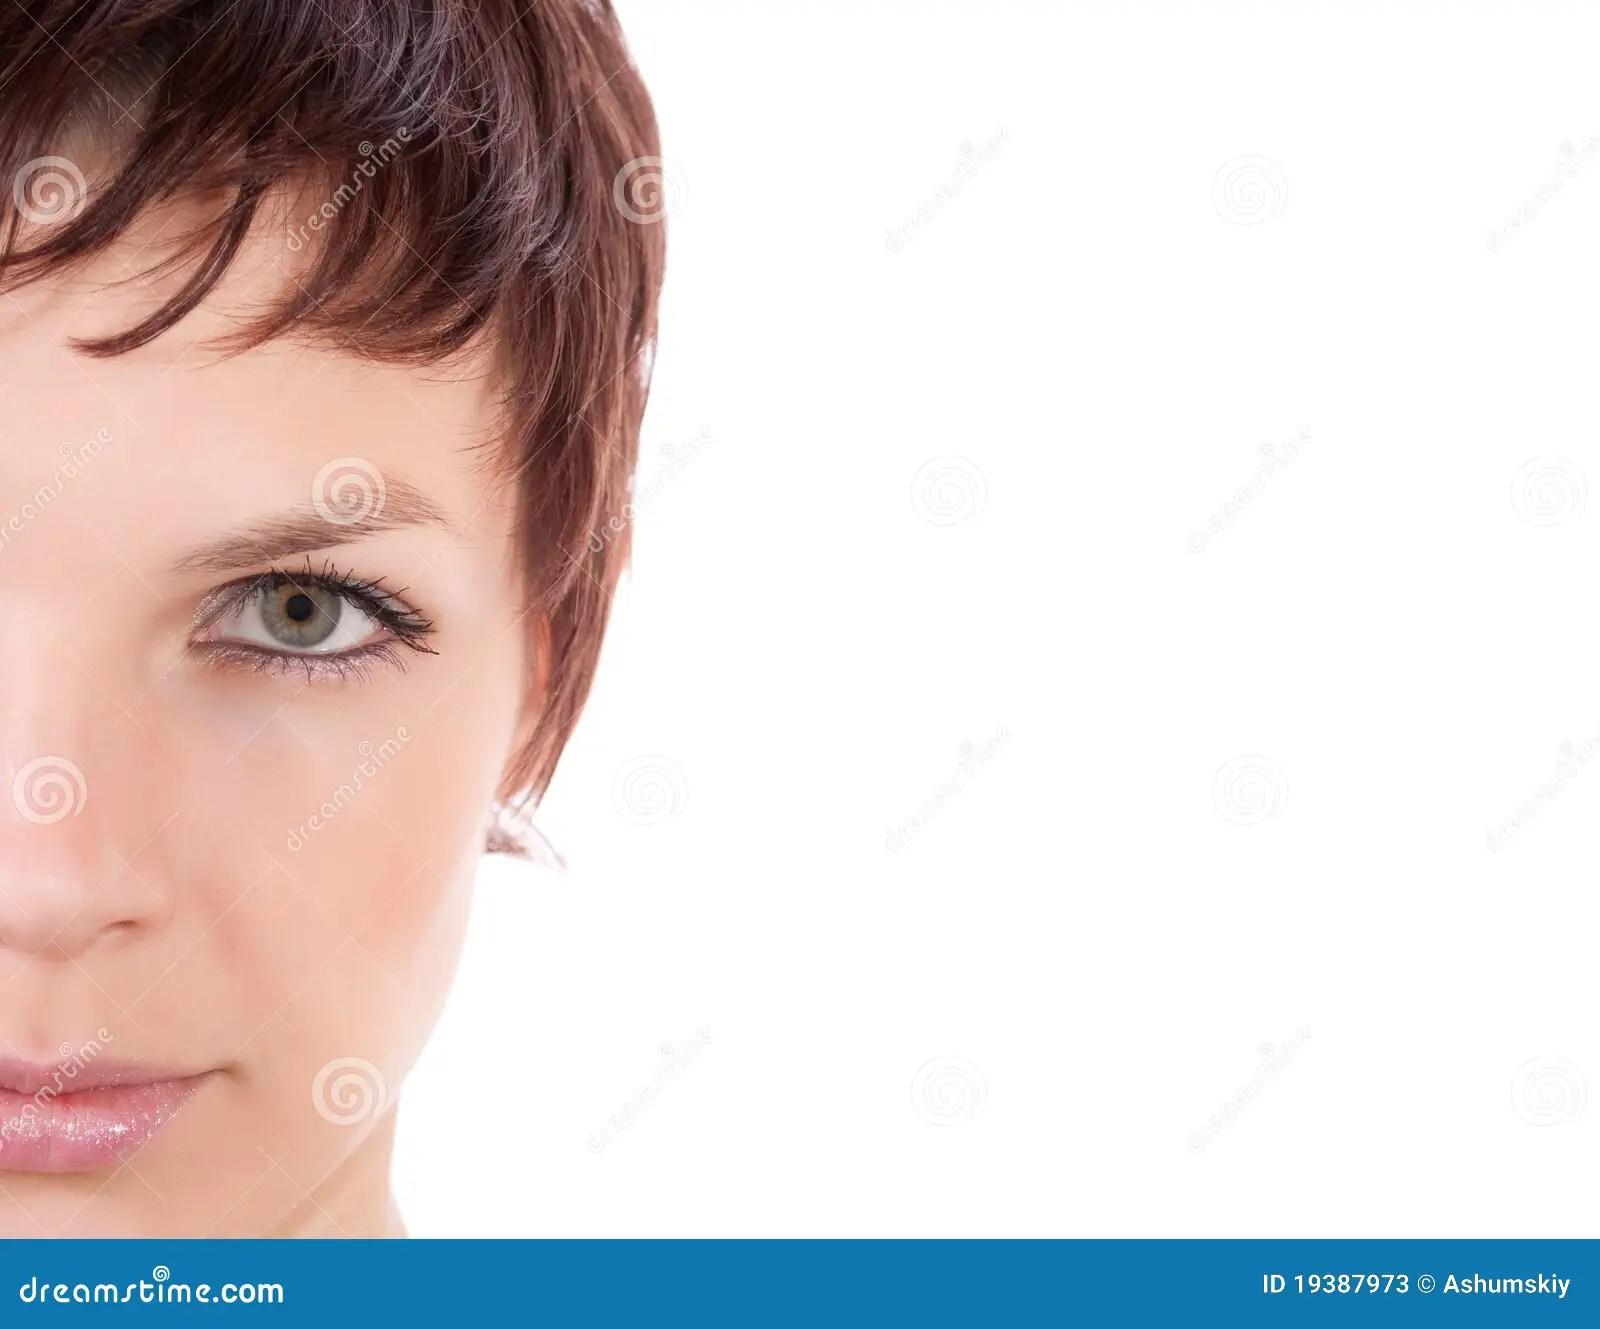 Half Face Portrait Stock Photos